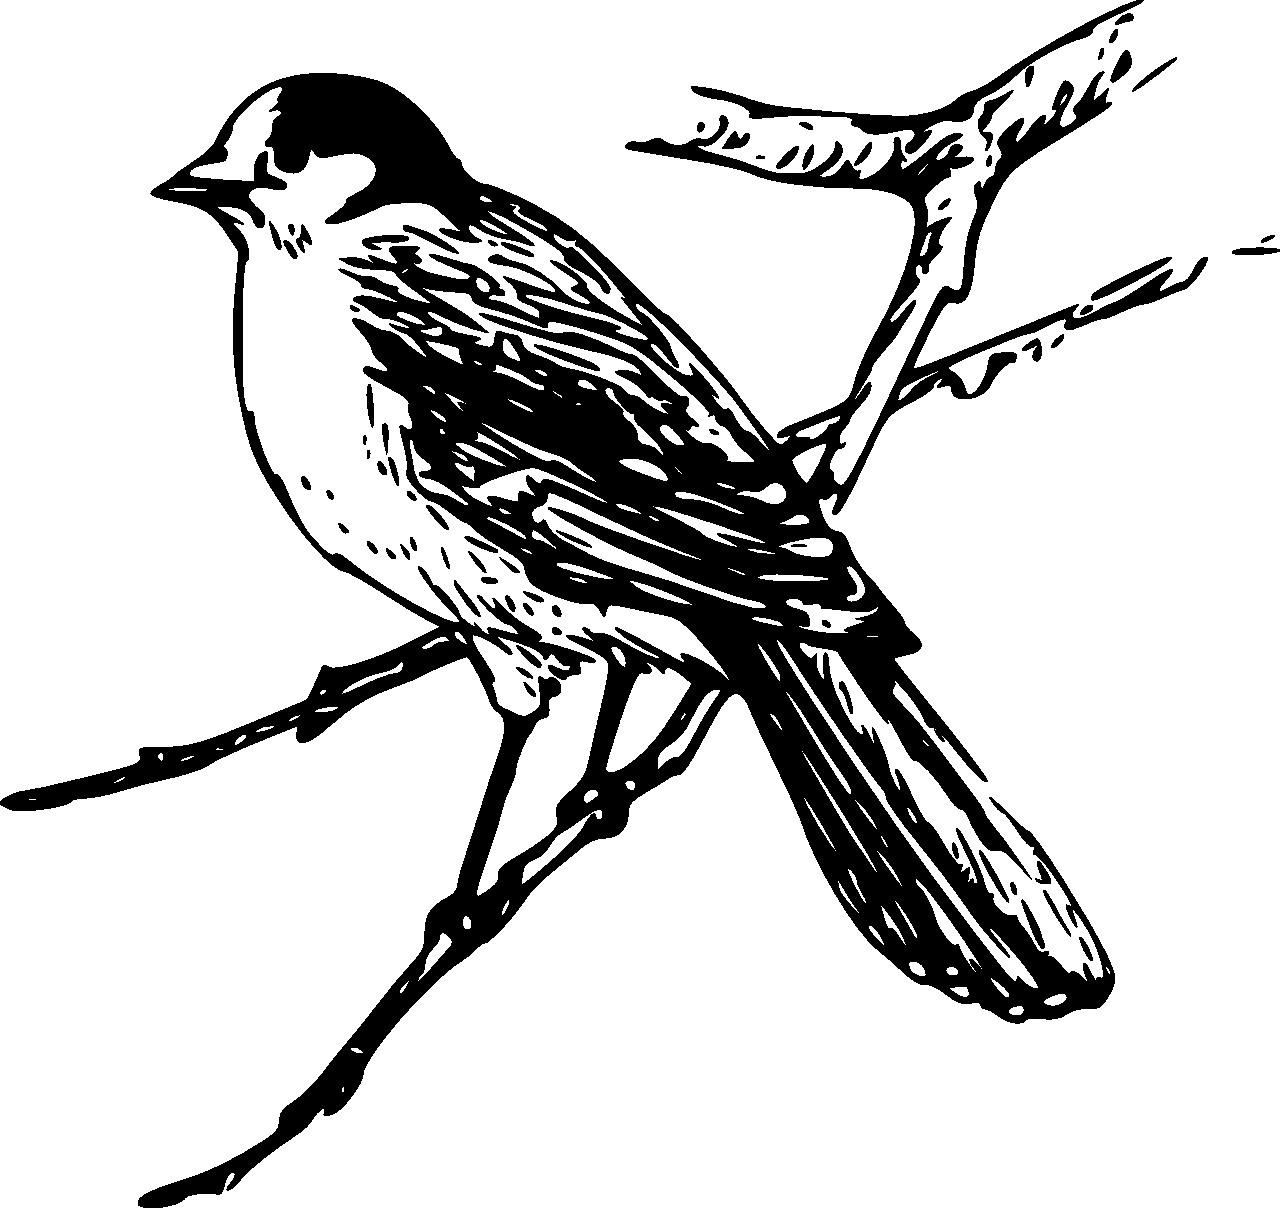 Gray Jay svg #20, Download drawings